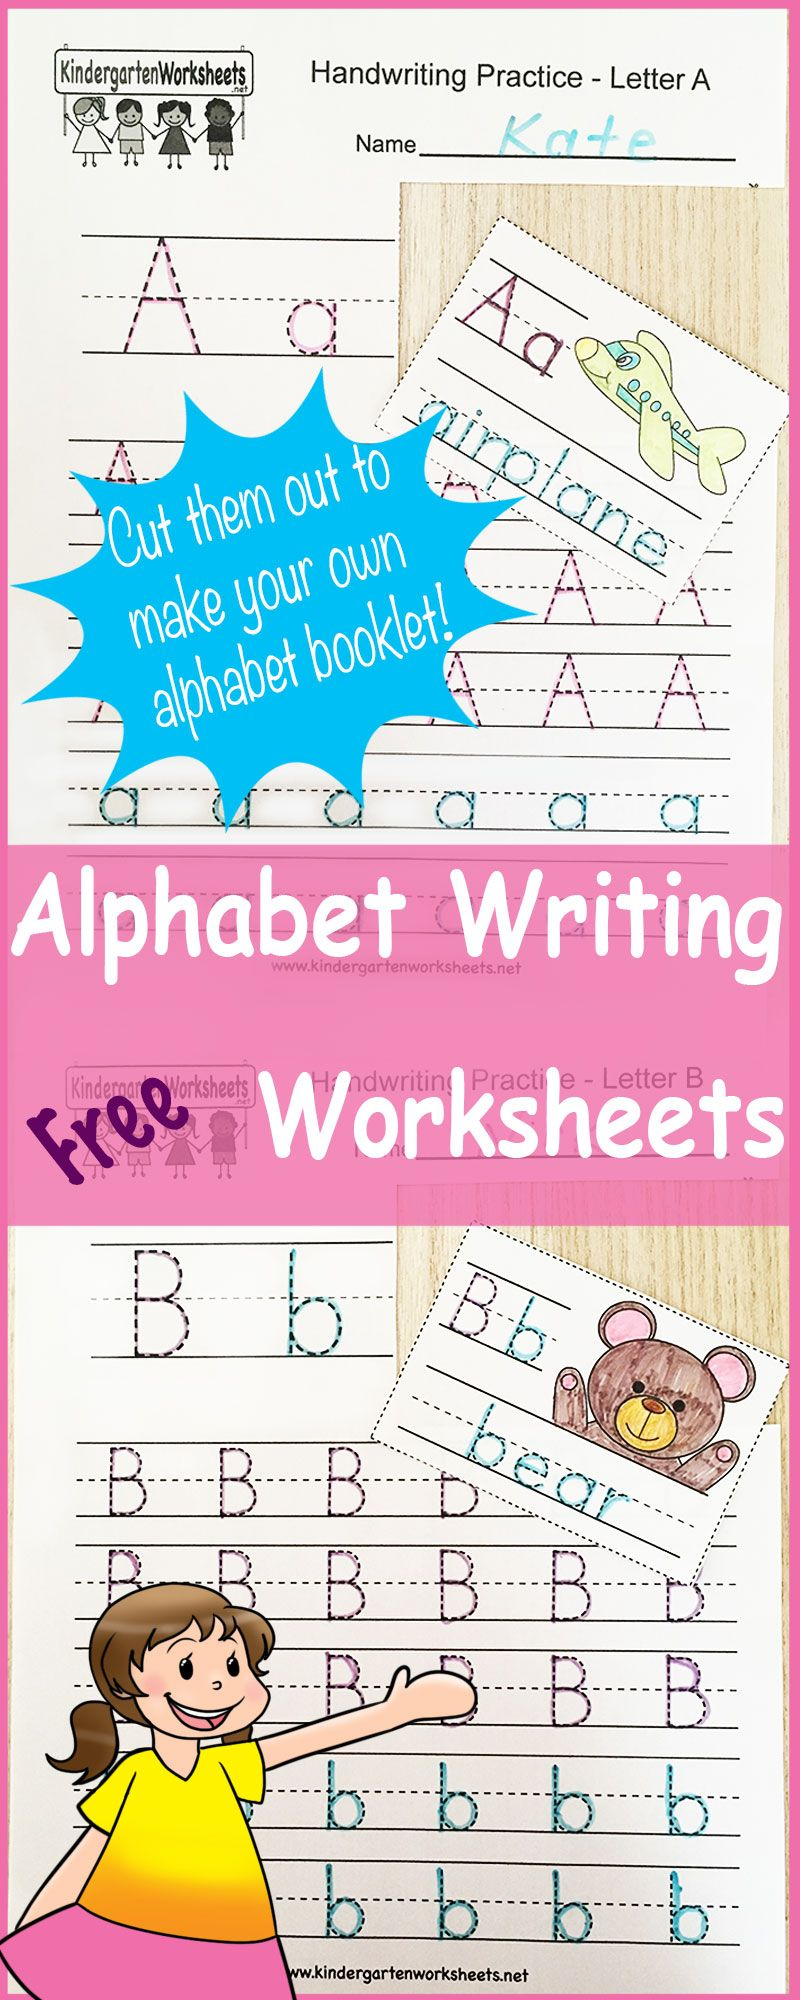 Handwriting Alphabet Worksheet This Series Of Handwriting Alphabet Worksheets Can Also Be Writing Worksheets Kindergarten Writing Alphabet Writing Worksheets [ 2000 x 800 Pixel ]